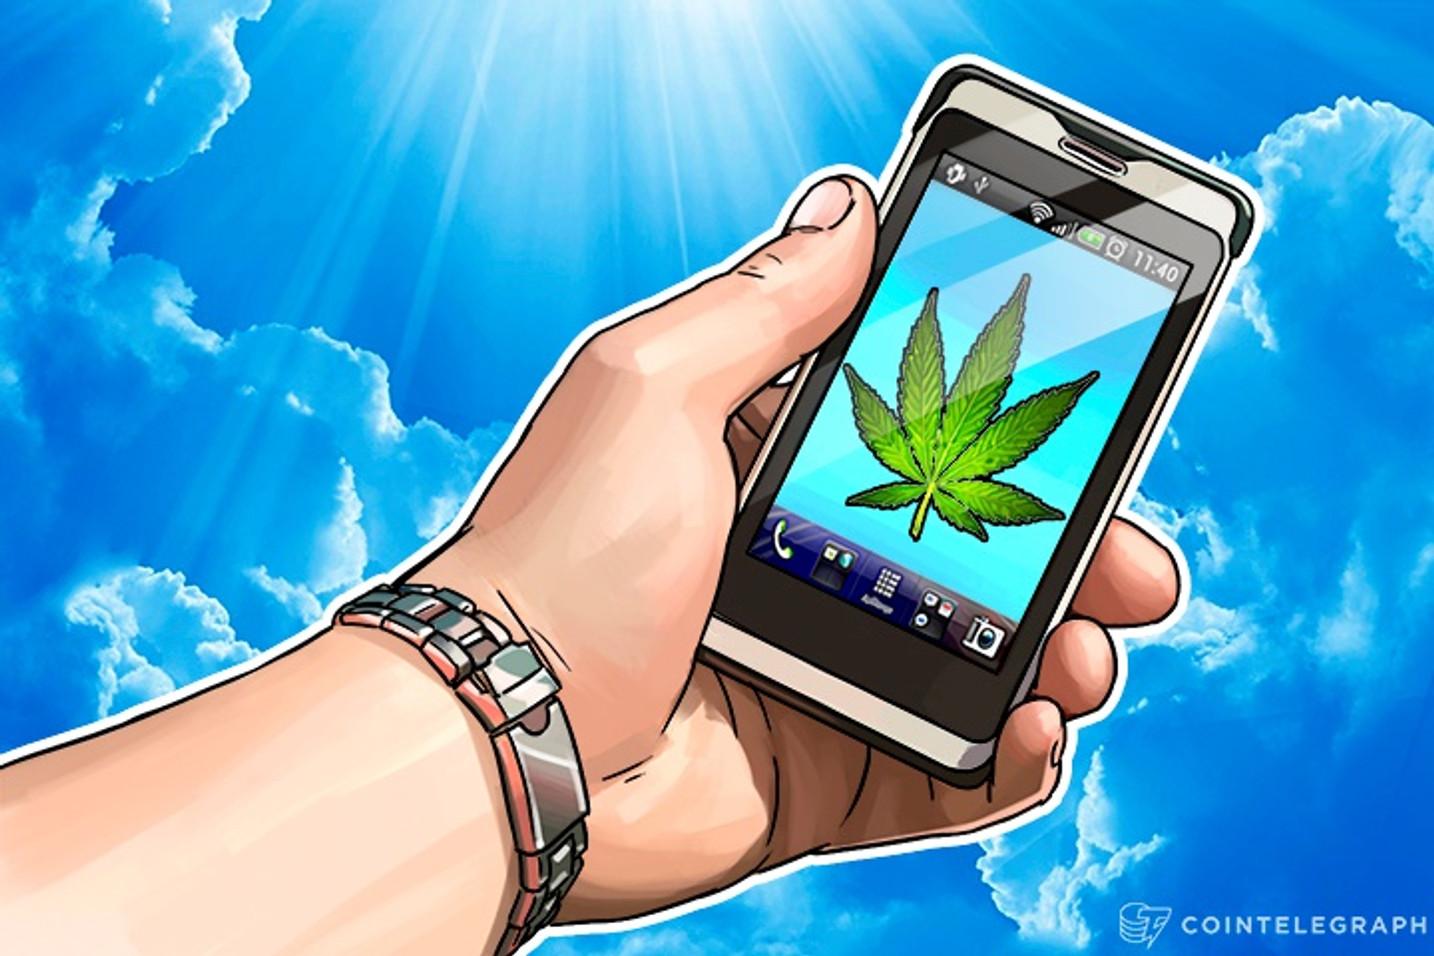 Medical Marijuana App Solves Industry's Cash-Only Payments Problem